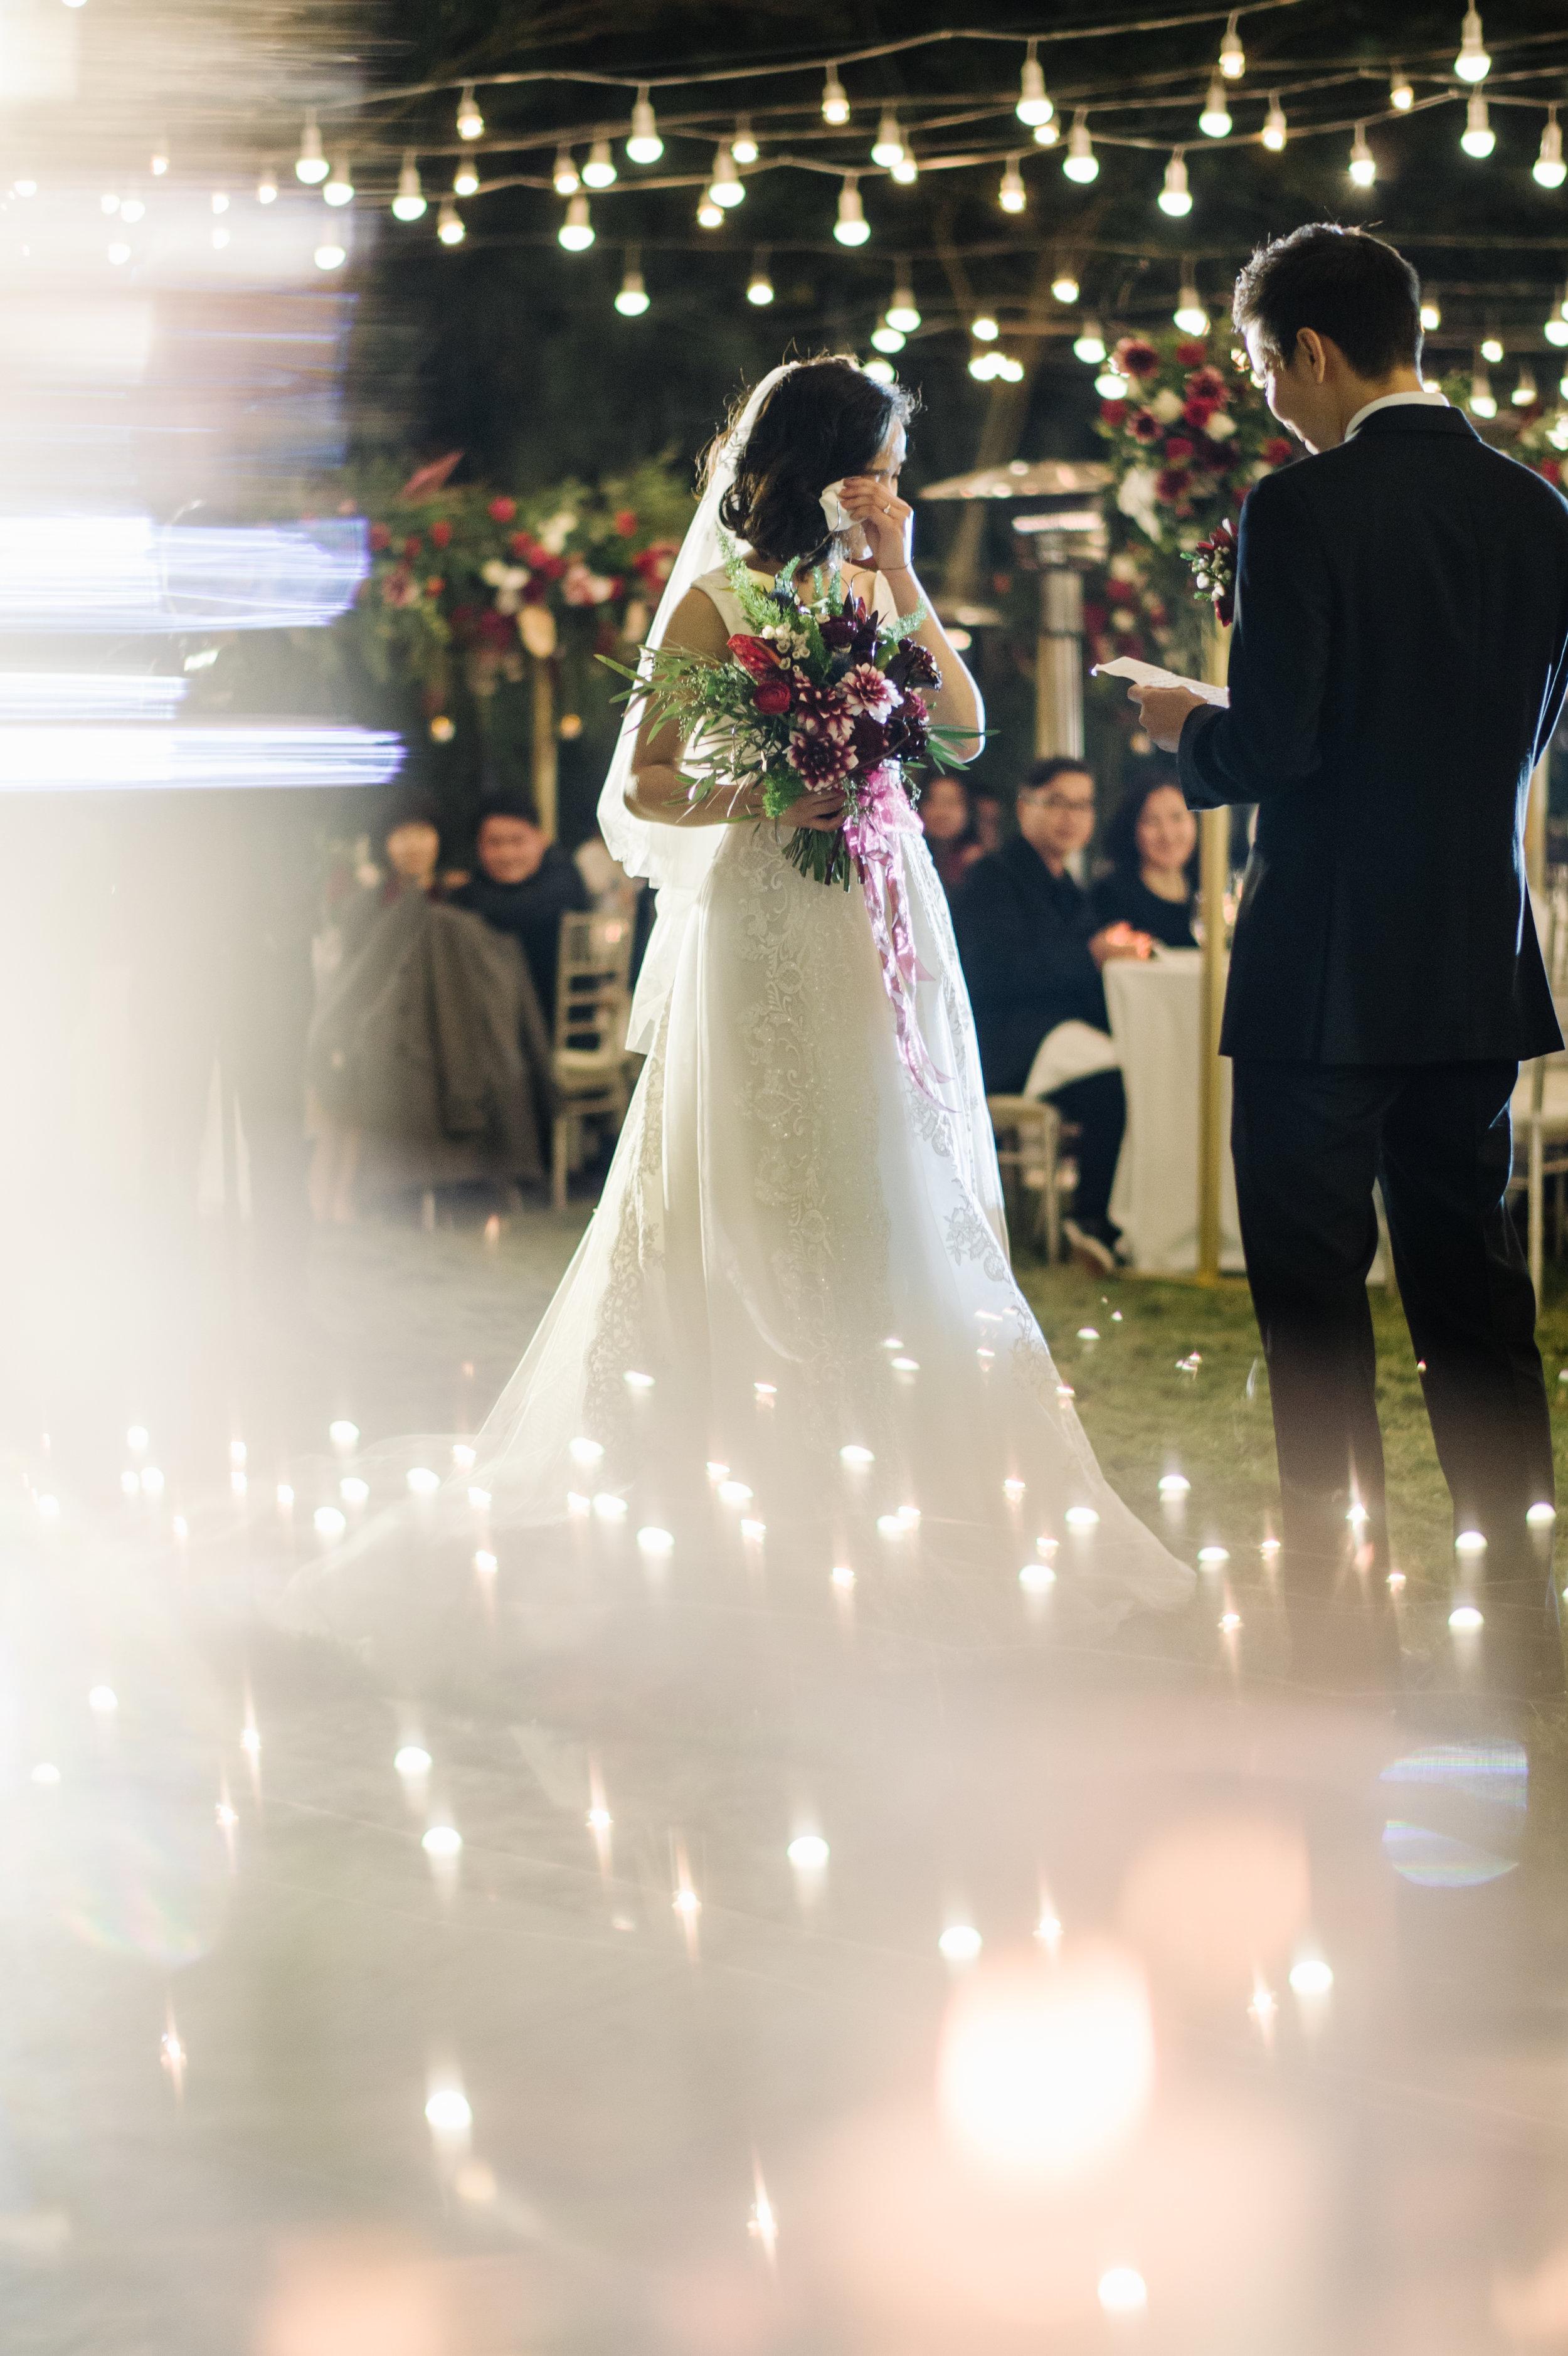 - CLIENTSPhuong Anh & Viet DungVENUEElegant Suites WestlakesPHOTOManh Bi WeddingDECORATION PHOTOCabo StudioWEDDING DRESSSHE by Hoa Nguyen